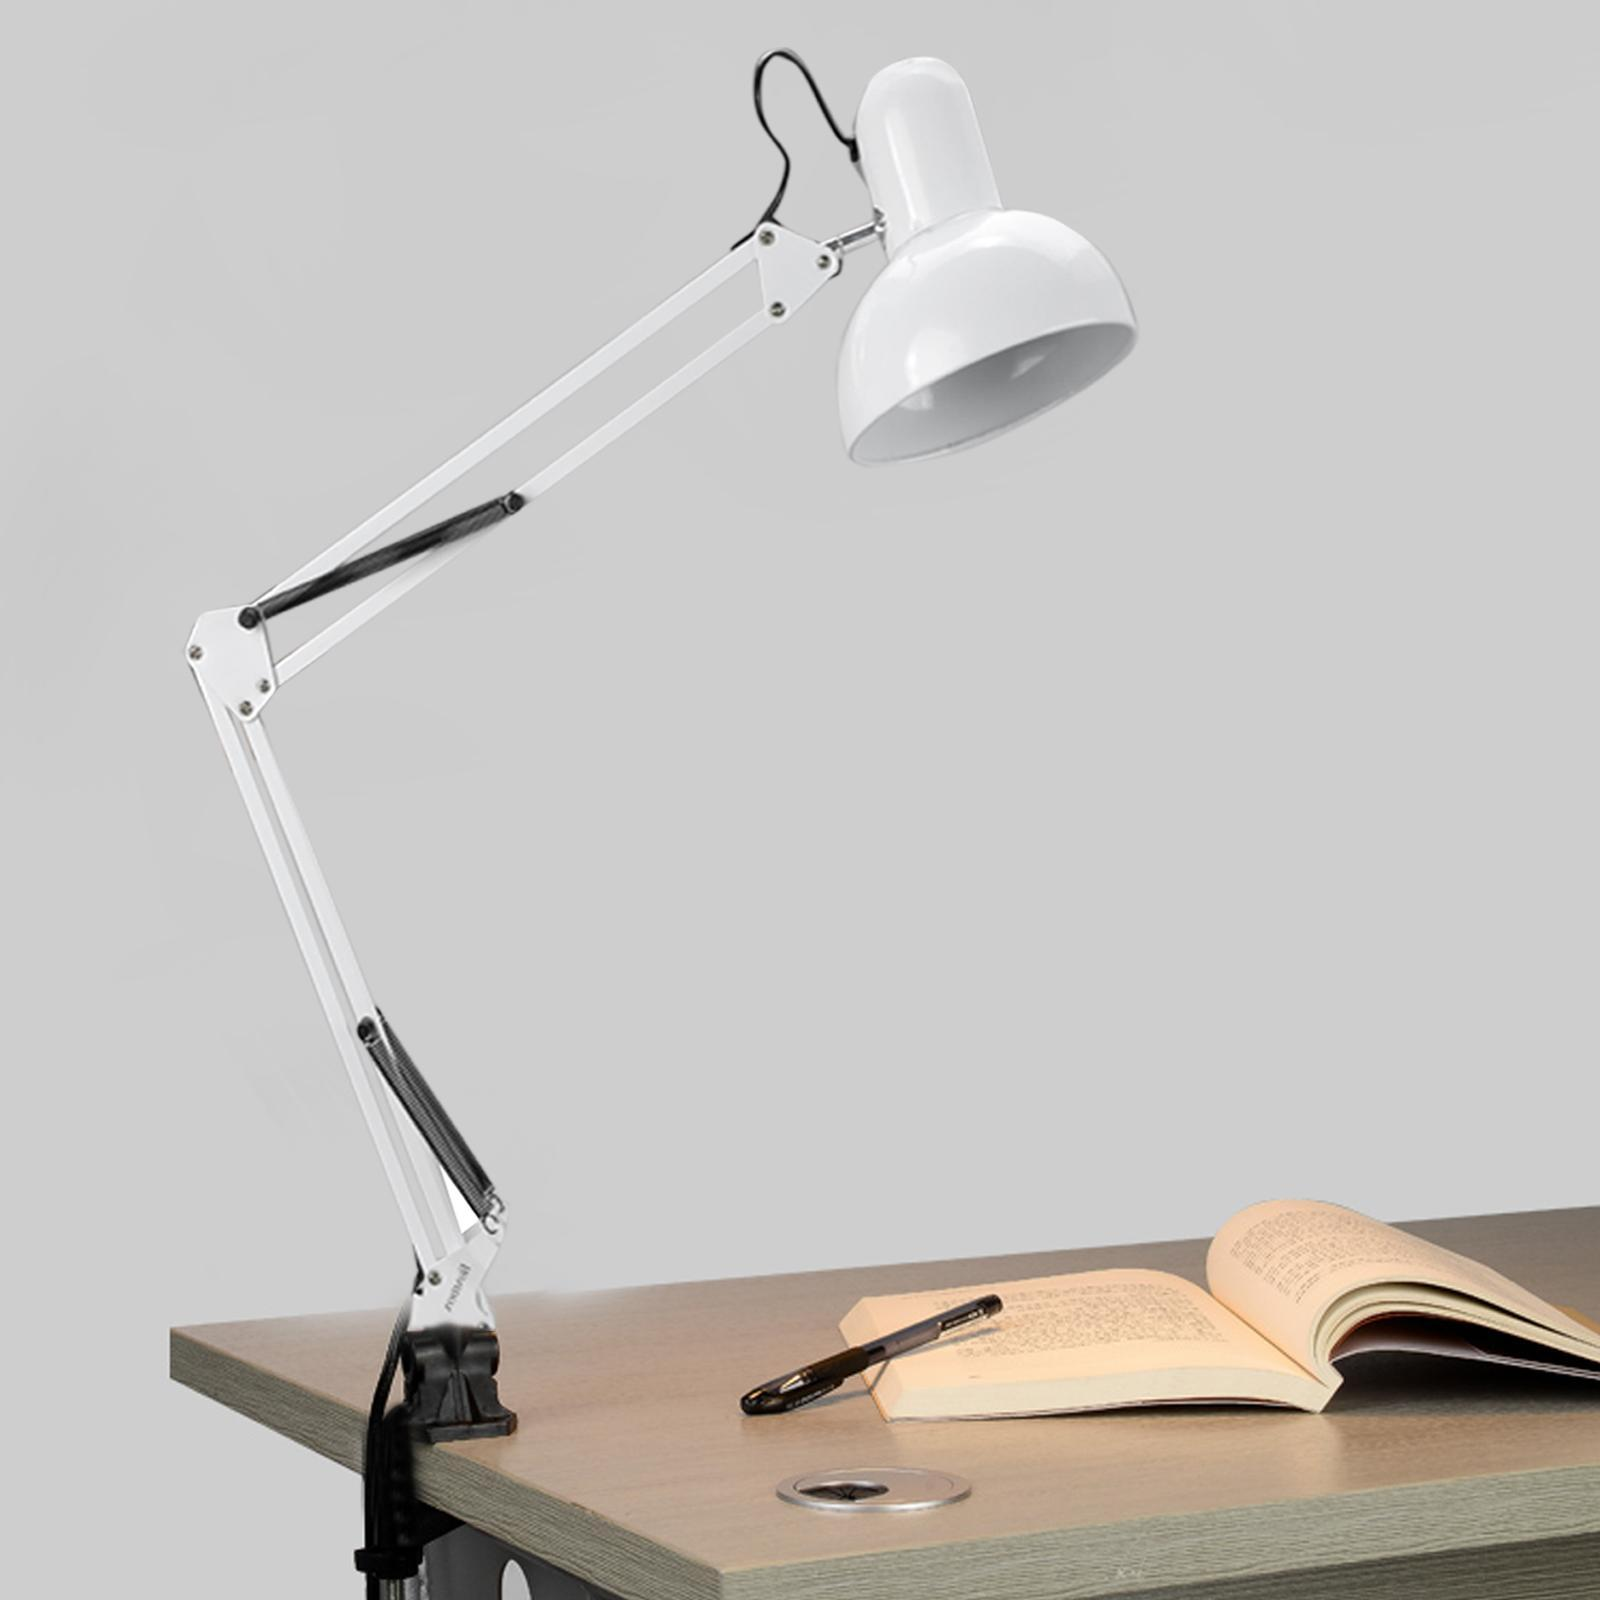 Arm Homdox Drafting Office Studio Clamp Table Lamp Light Fold EBay .